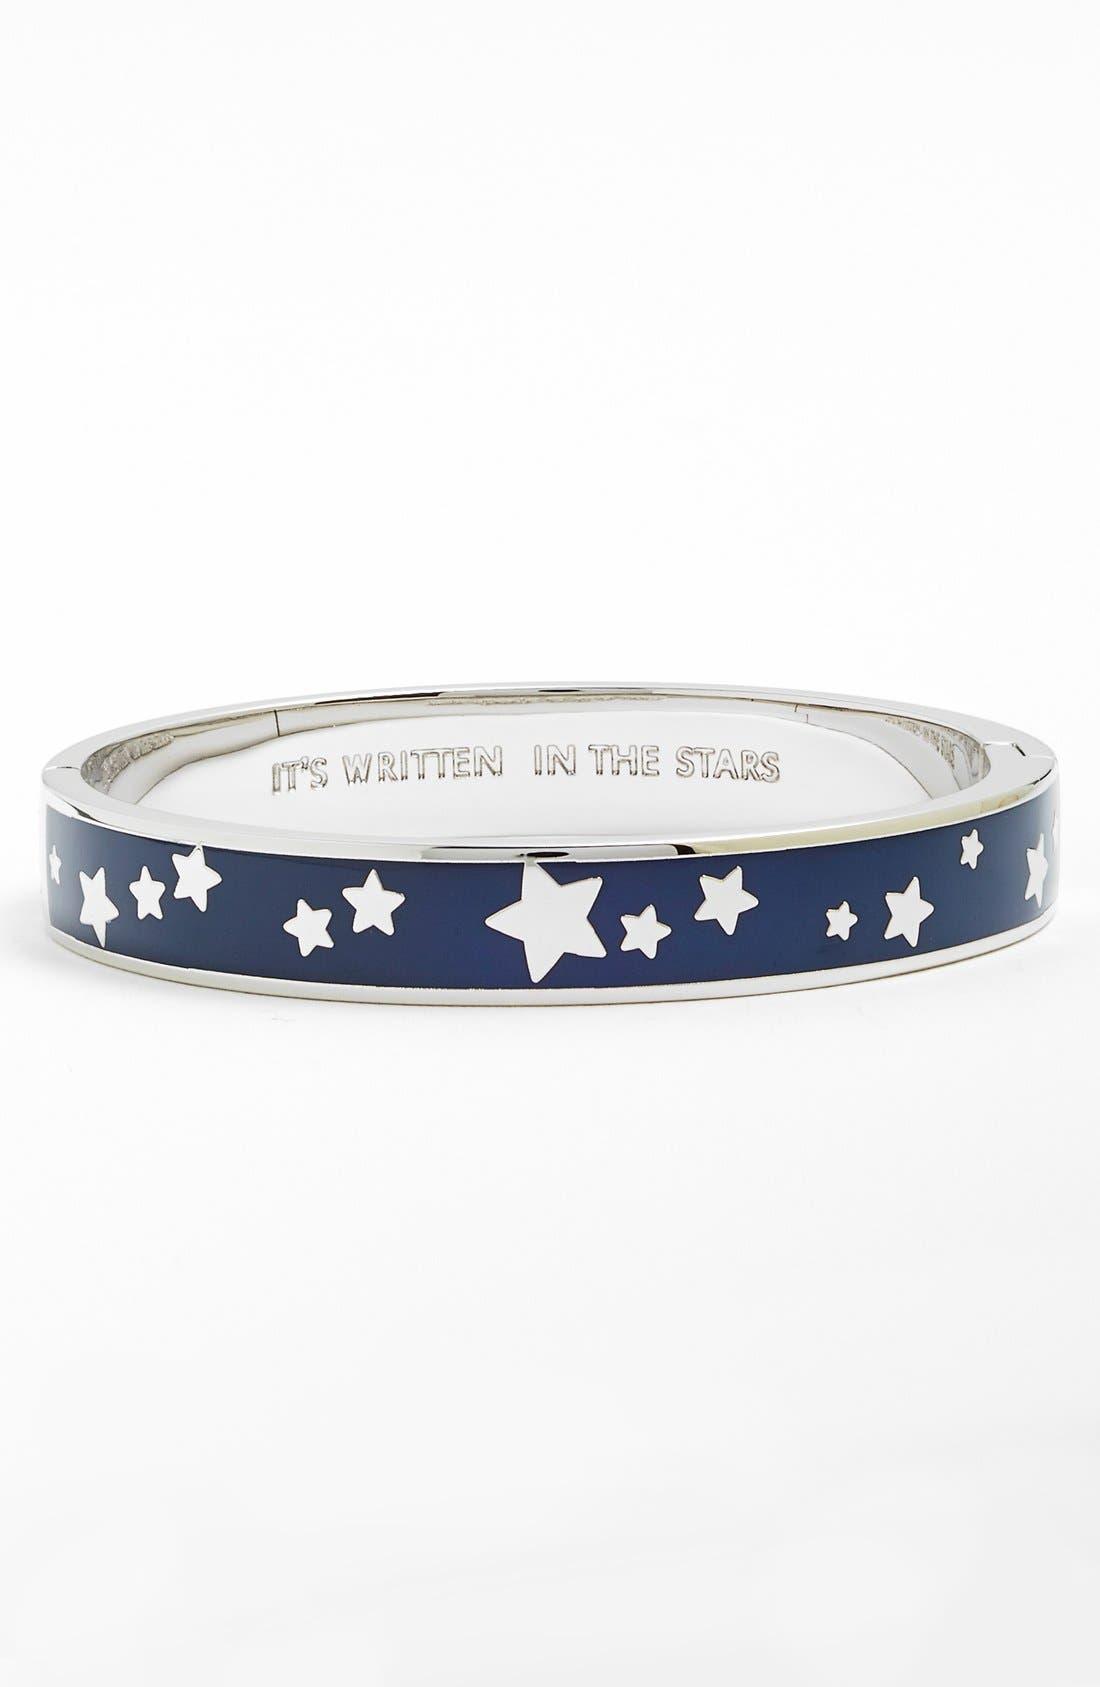 Alternate Image 1 Selected - kate spade new york 'idiom - it's written in the stars' enamel bangle